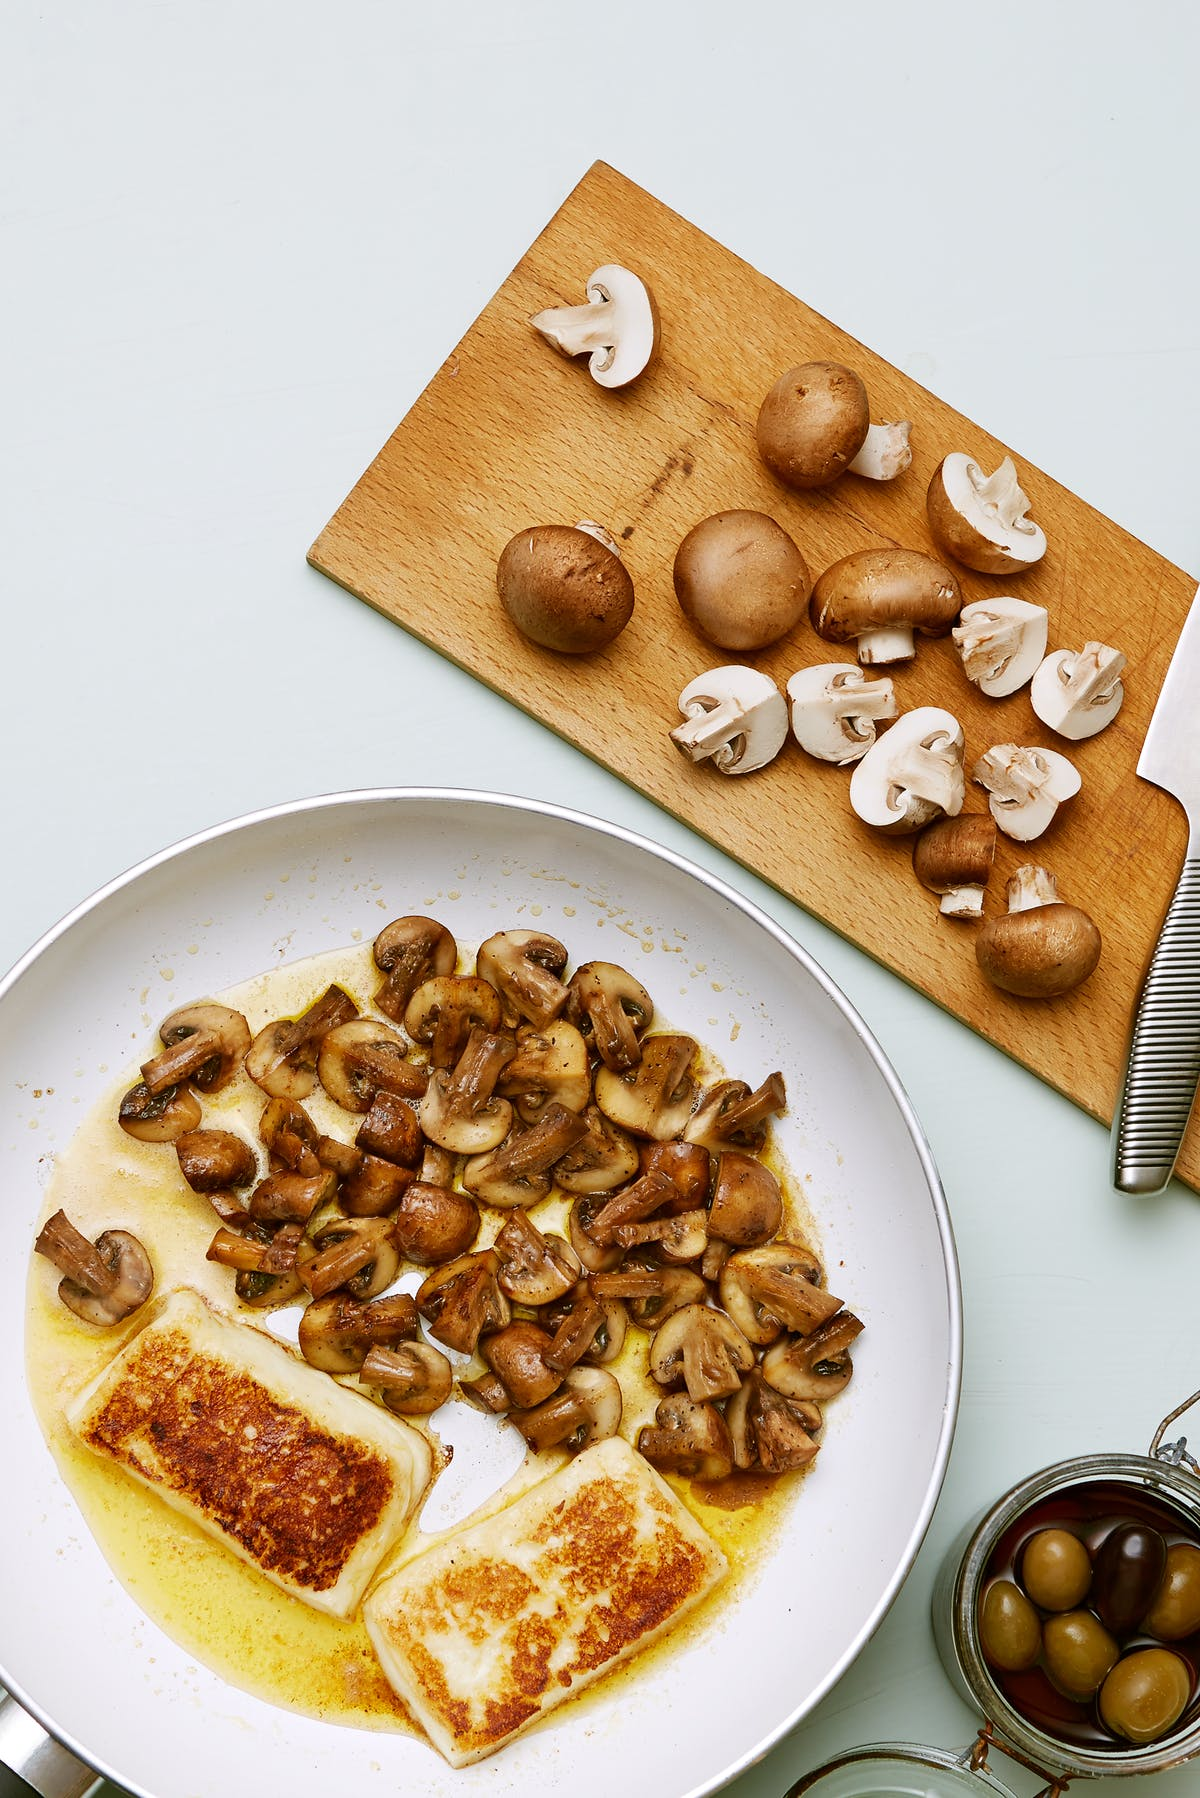 Keto fried halloumi cheese with mushrooms